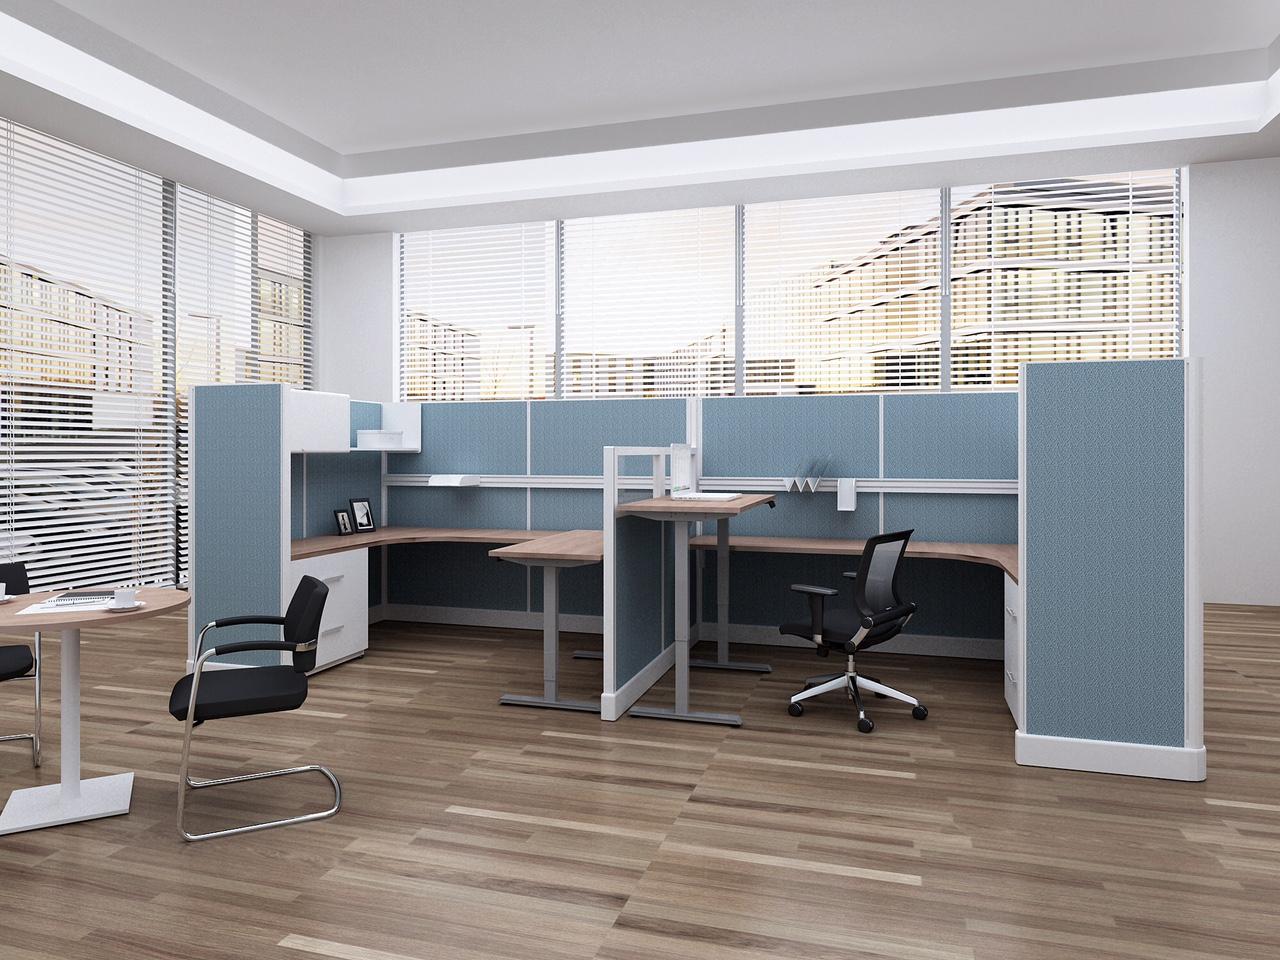 manasota-office-supplies-llc-adjustable-tables-in-bradenton-florida-manasota-office-supplies-llc-2-.jpg